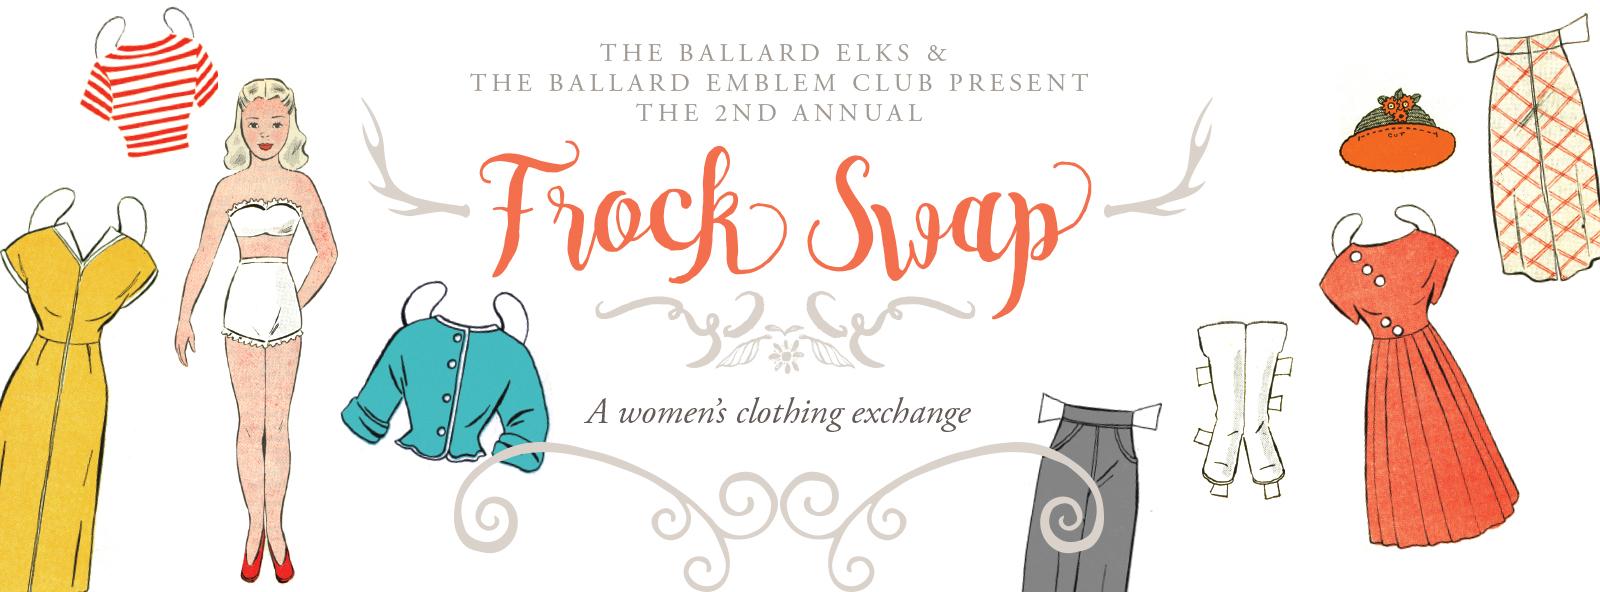 2nd Annual Frock Swap - A women's clothing exchange @ Ballard Elks Lodge   Seattle   Washington   United States